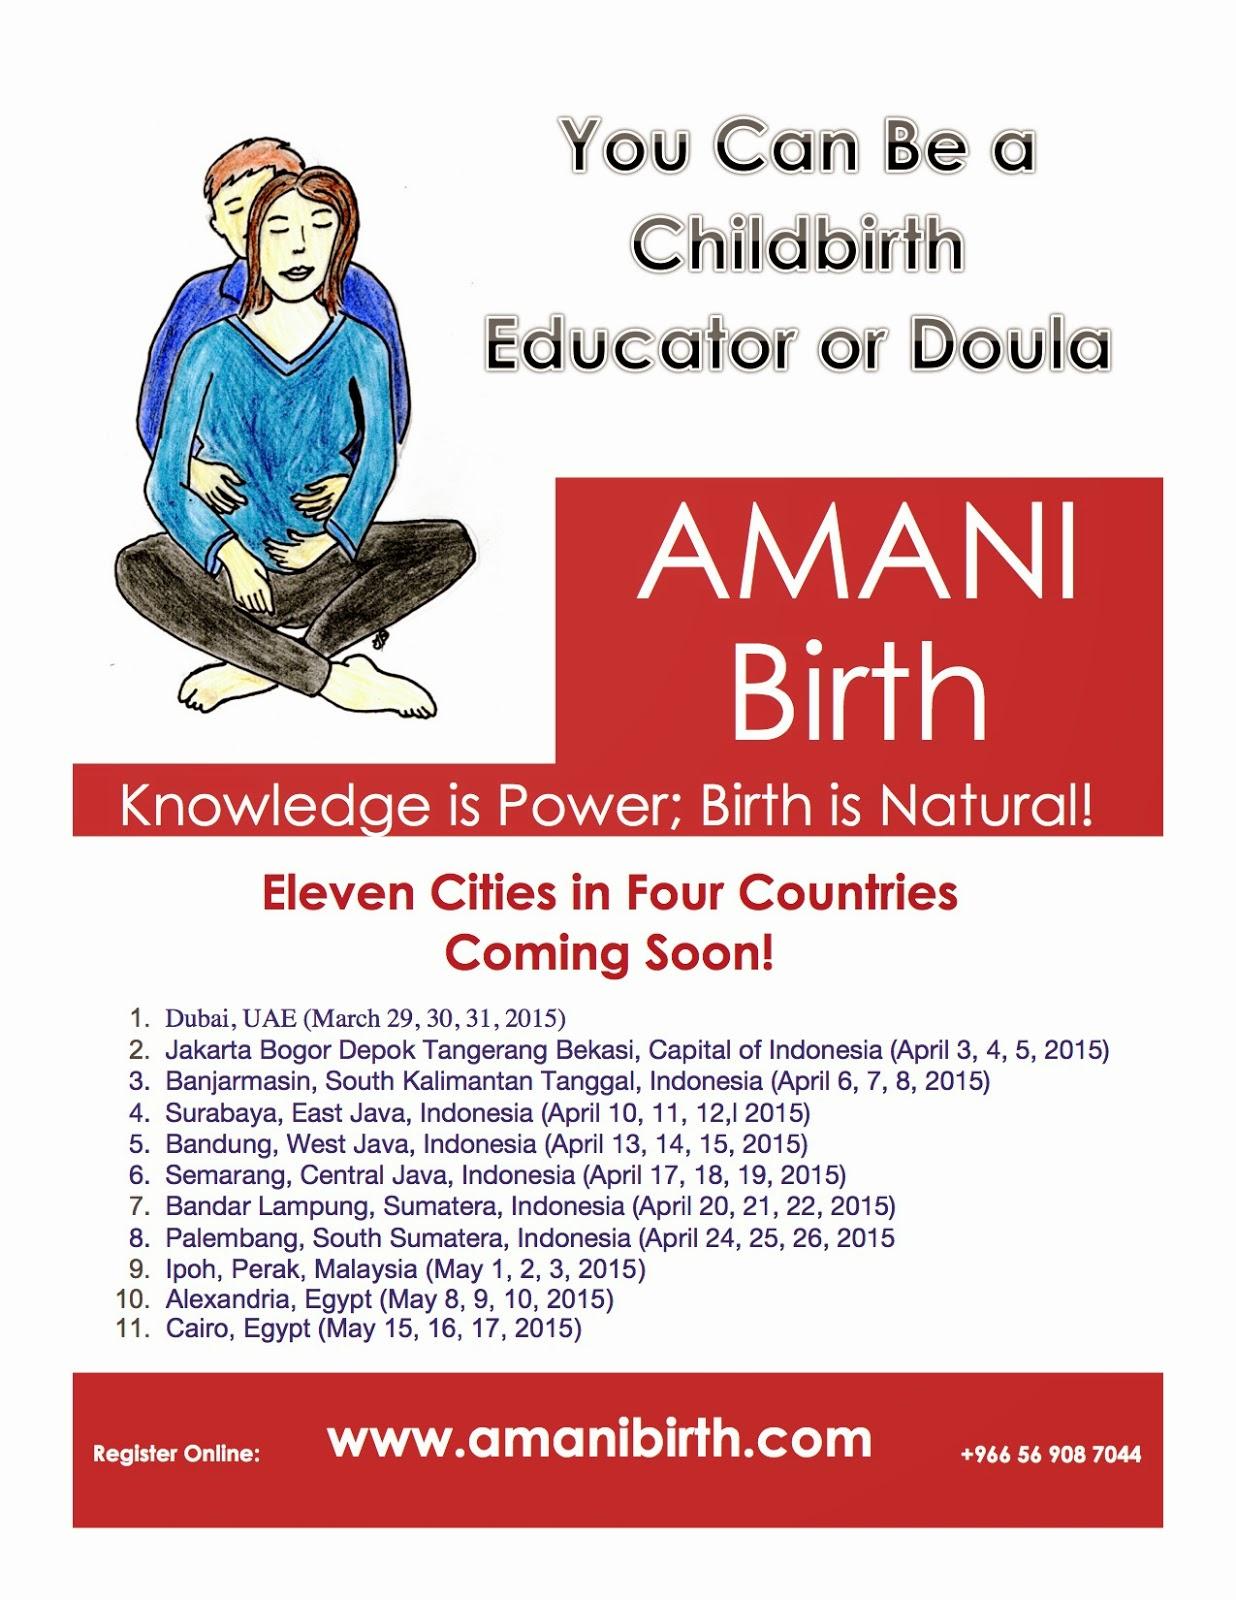 http://www.amanibirth.com/p/teacherdoula-training.html